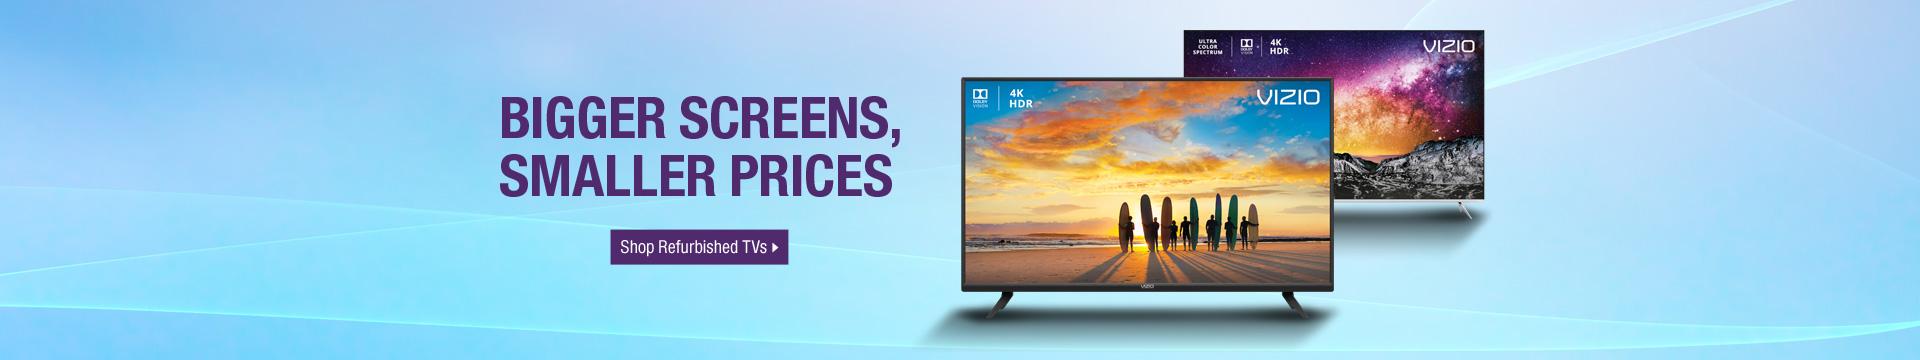 LED TVs, Smart HDTVs, 4K TVs - Newegg com